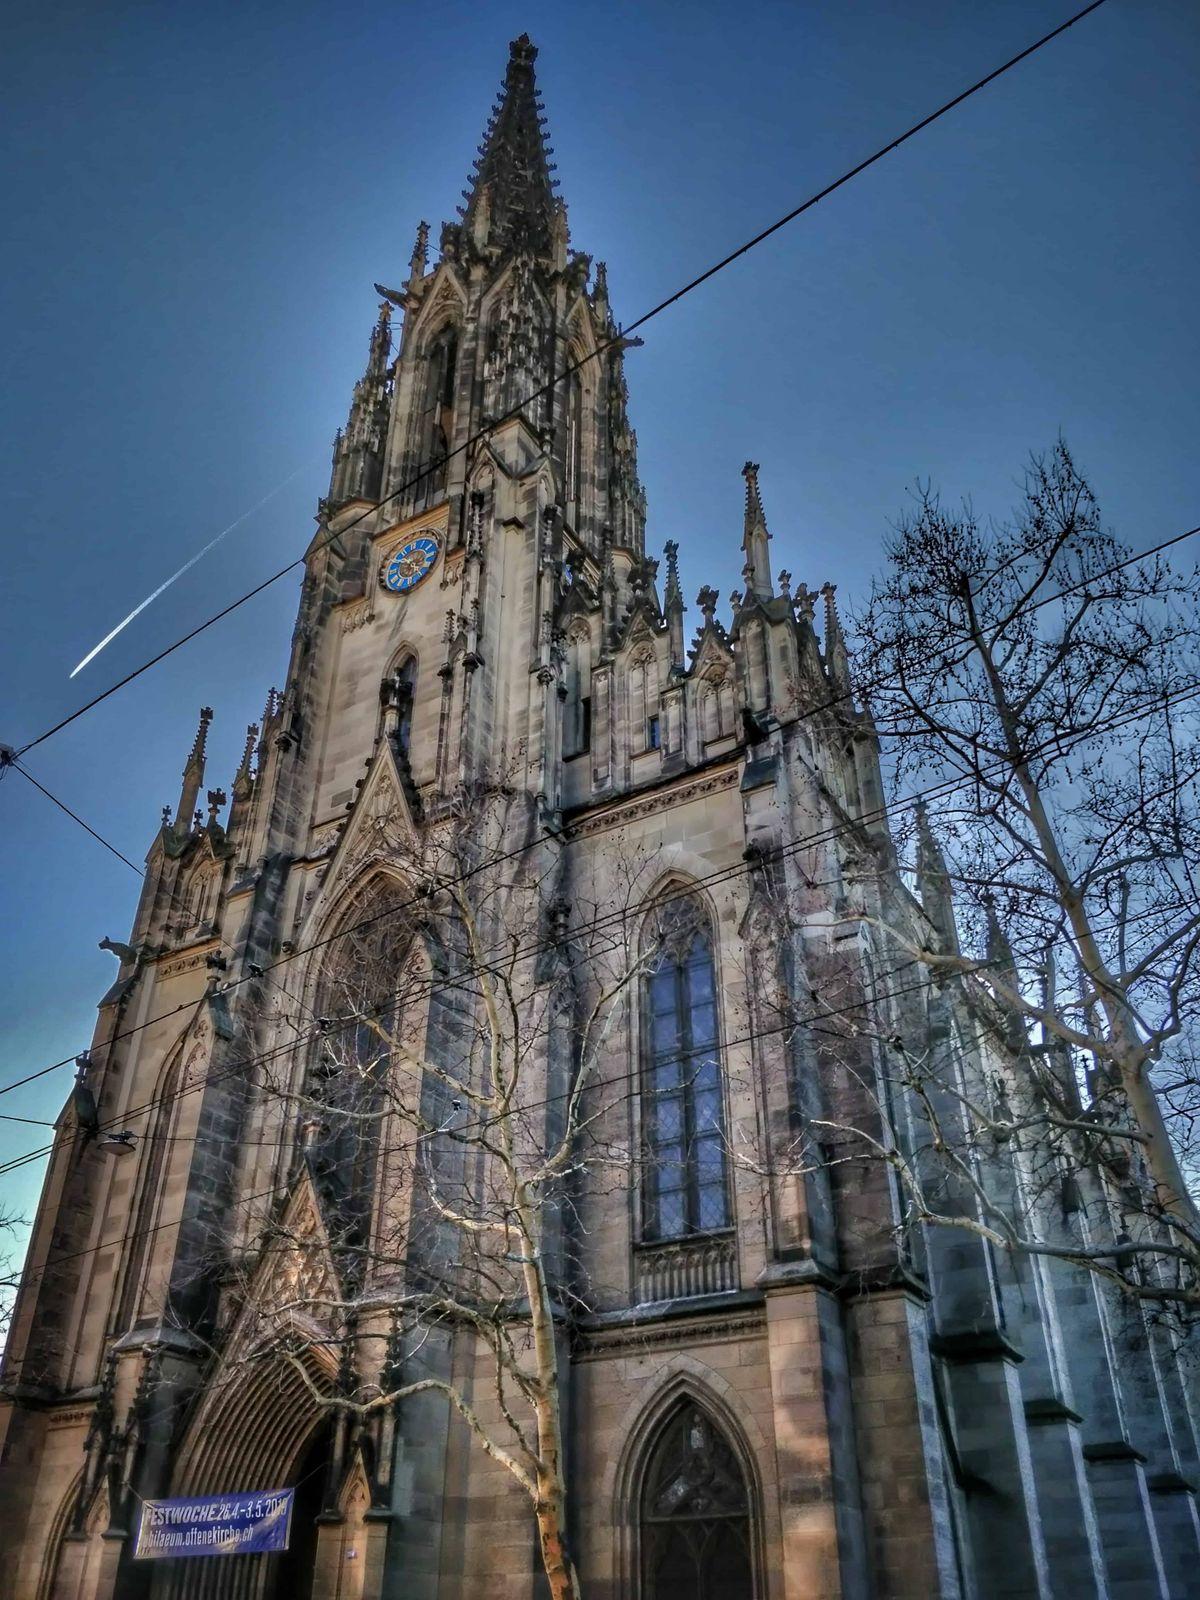 Gyönyörű templomaik is vannak